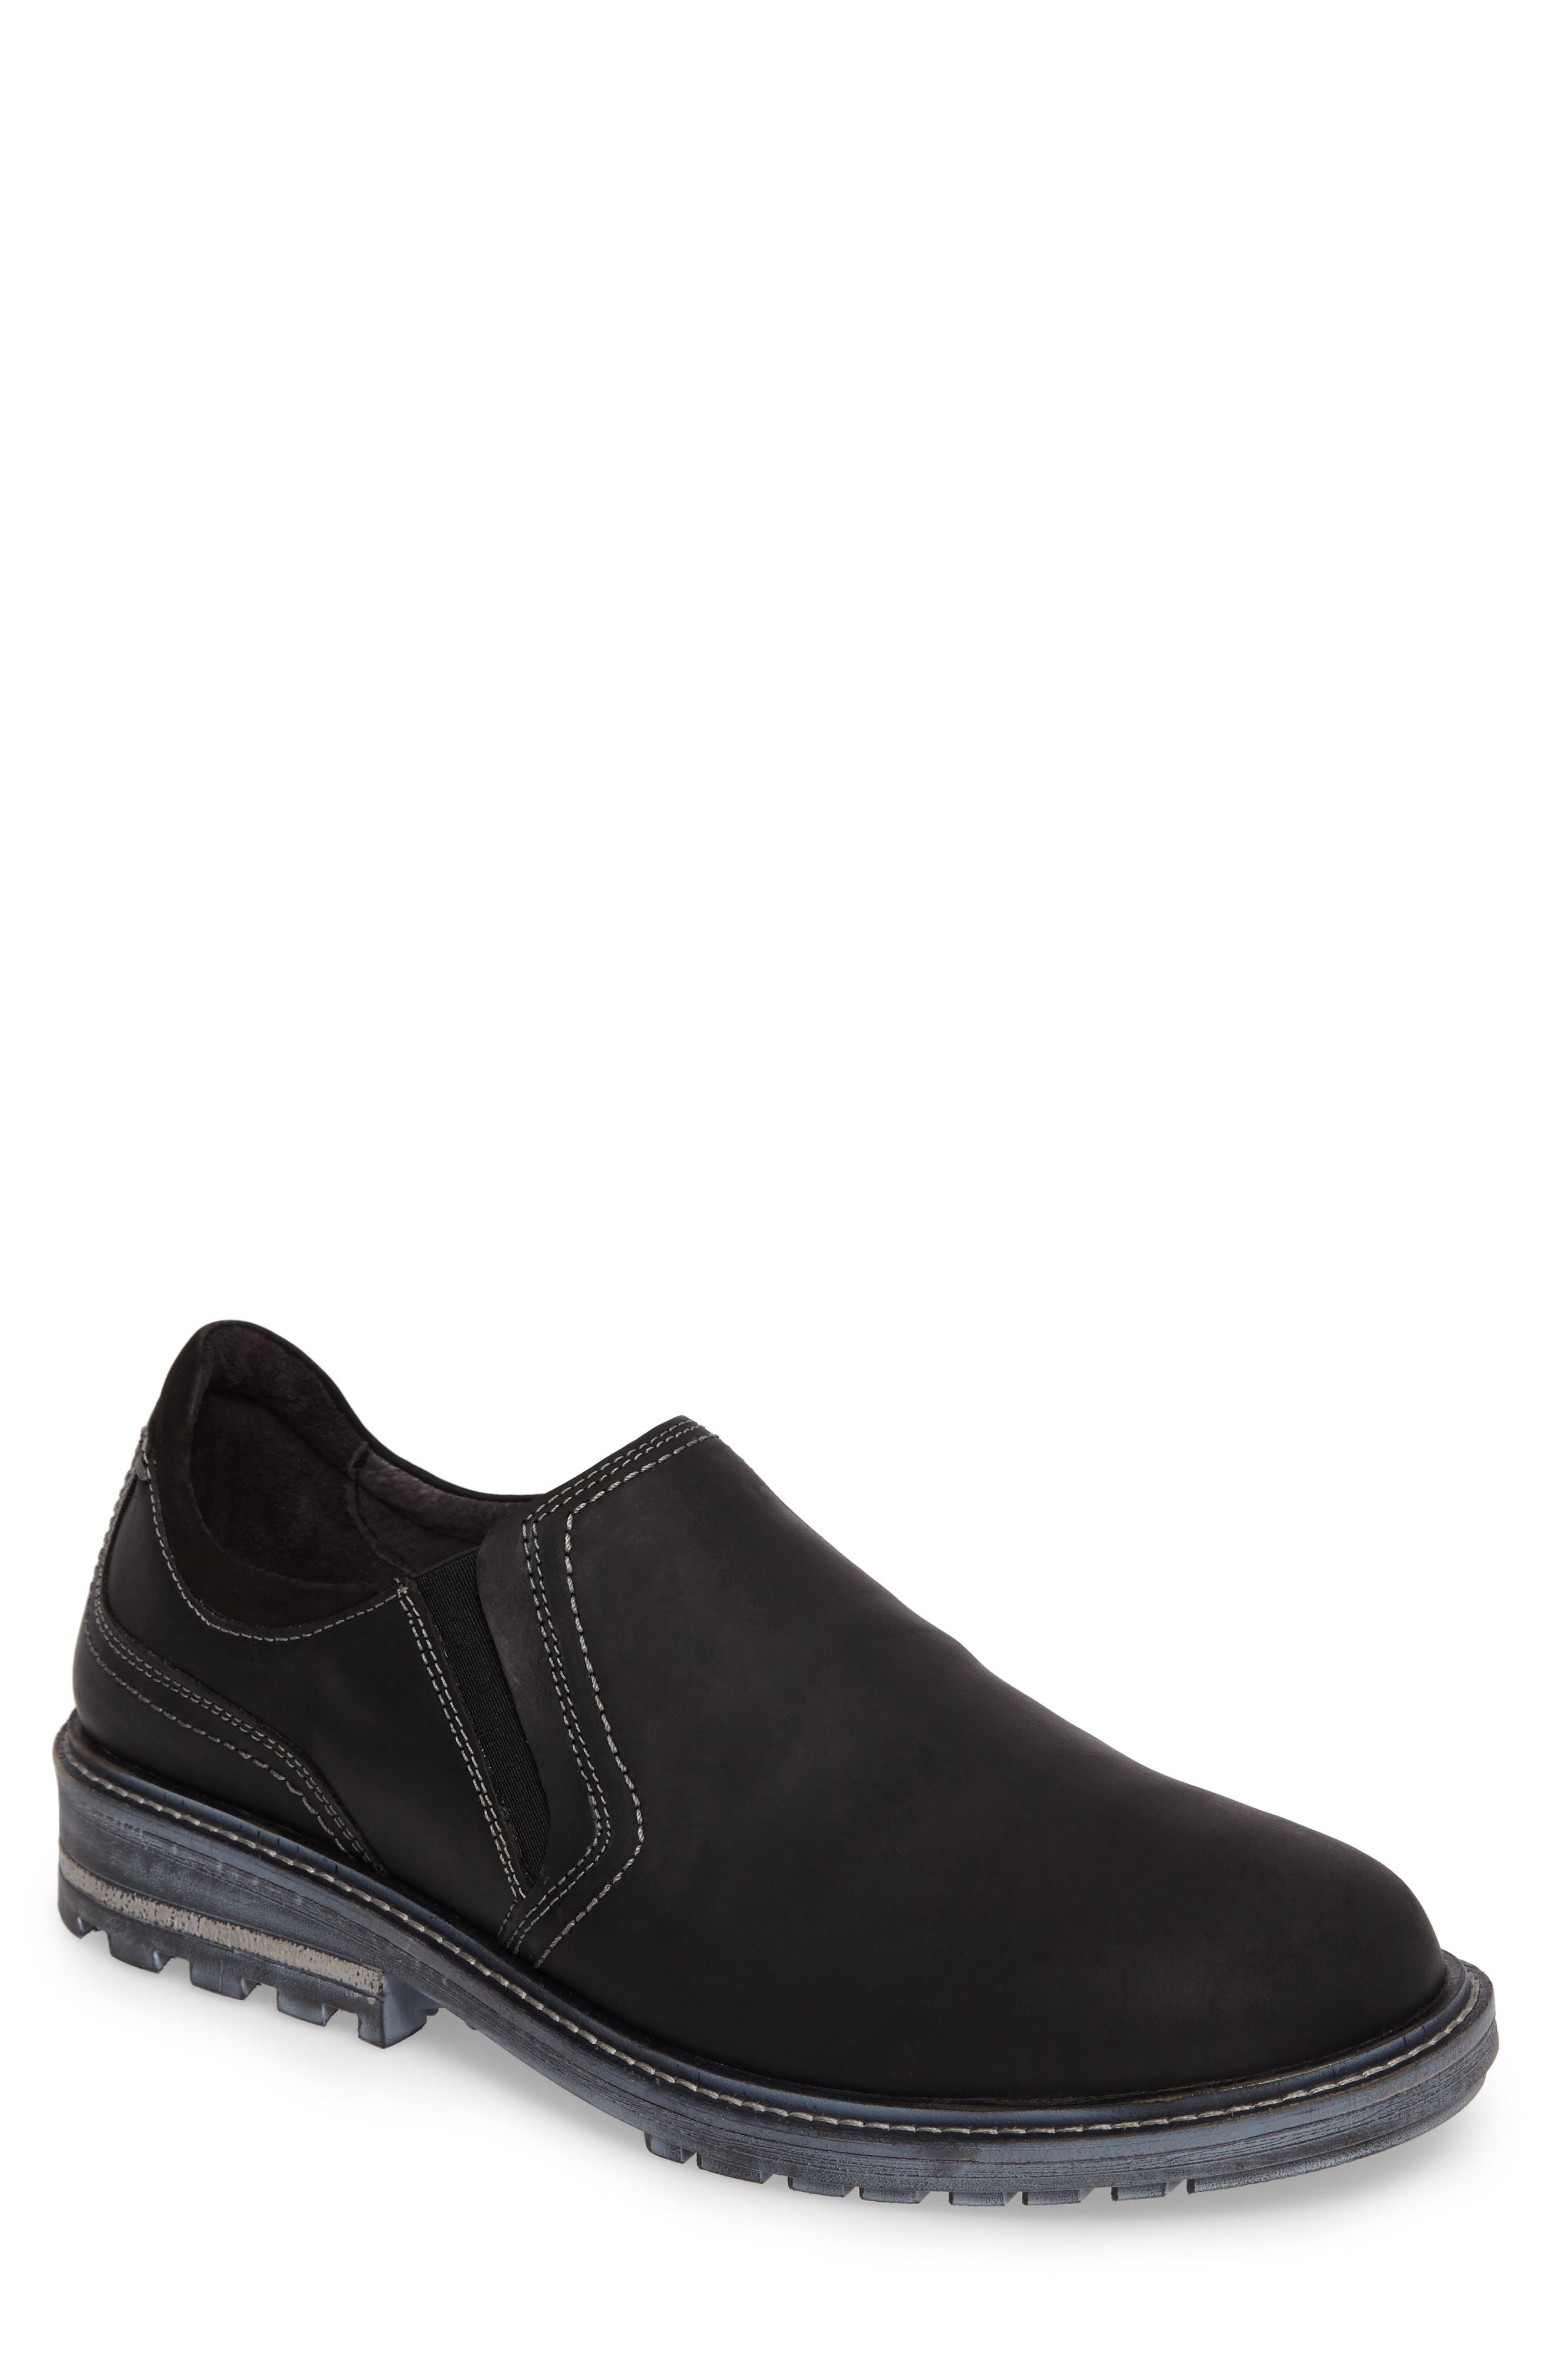 Manyara Slip-On Loafer,                         Main,                         color, COAL LEATHER